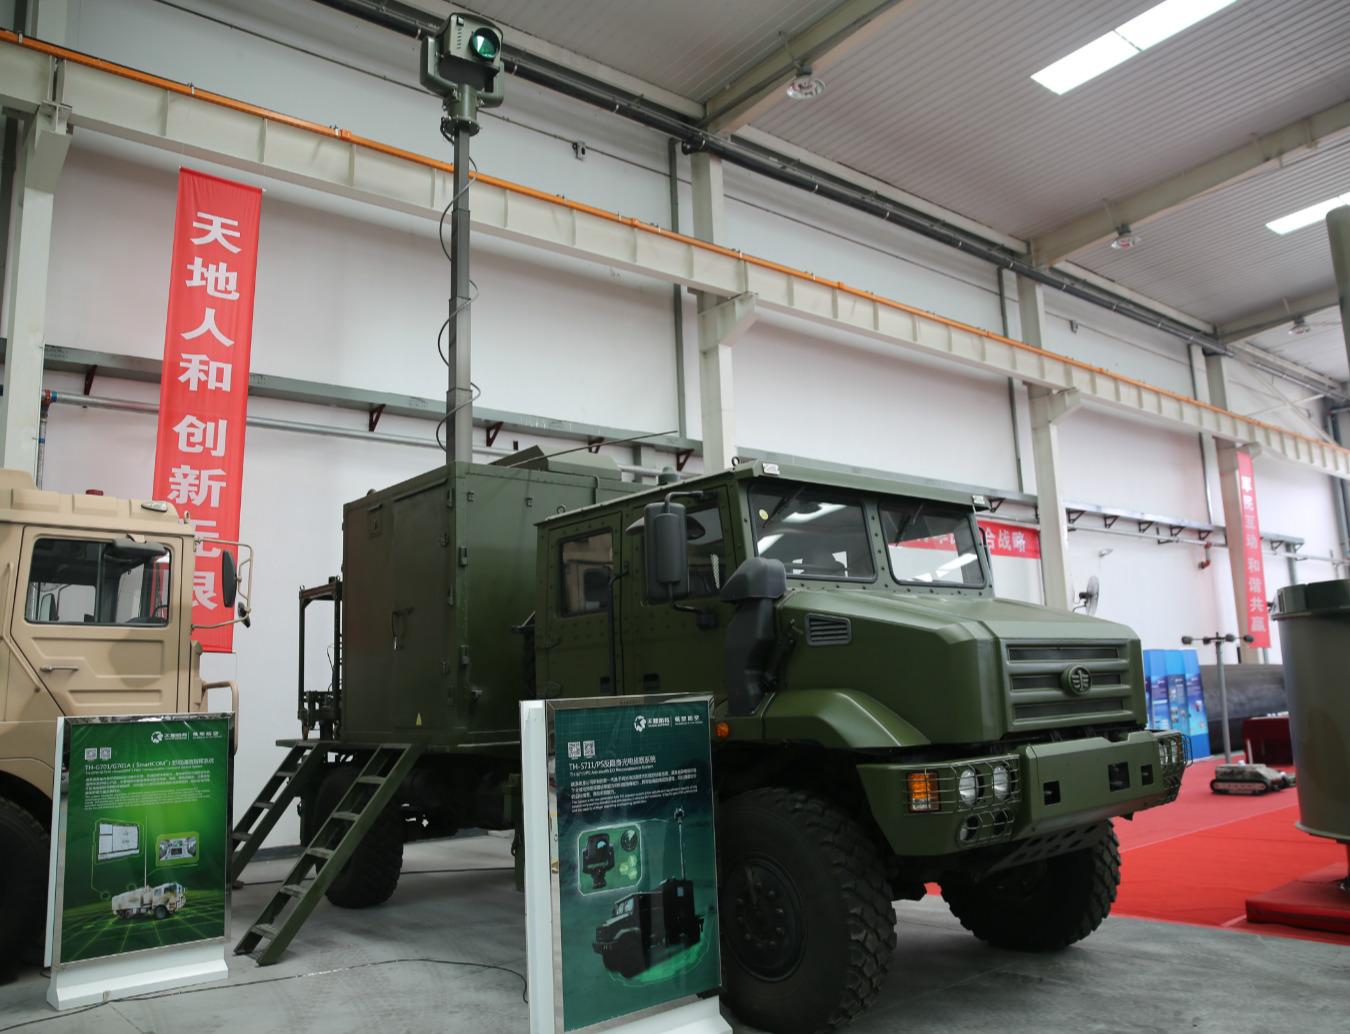 TH-S711/PS反隐身光电侦察系统